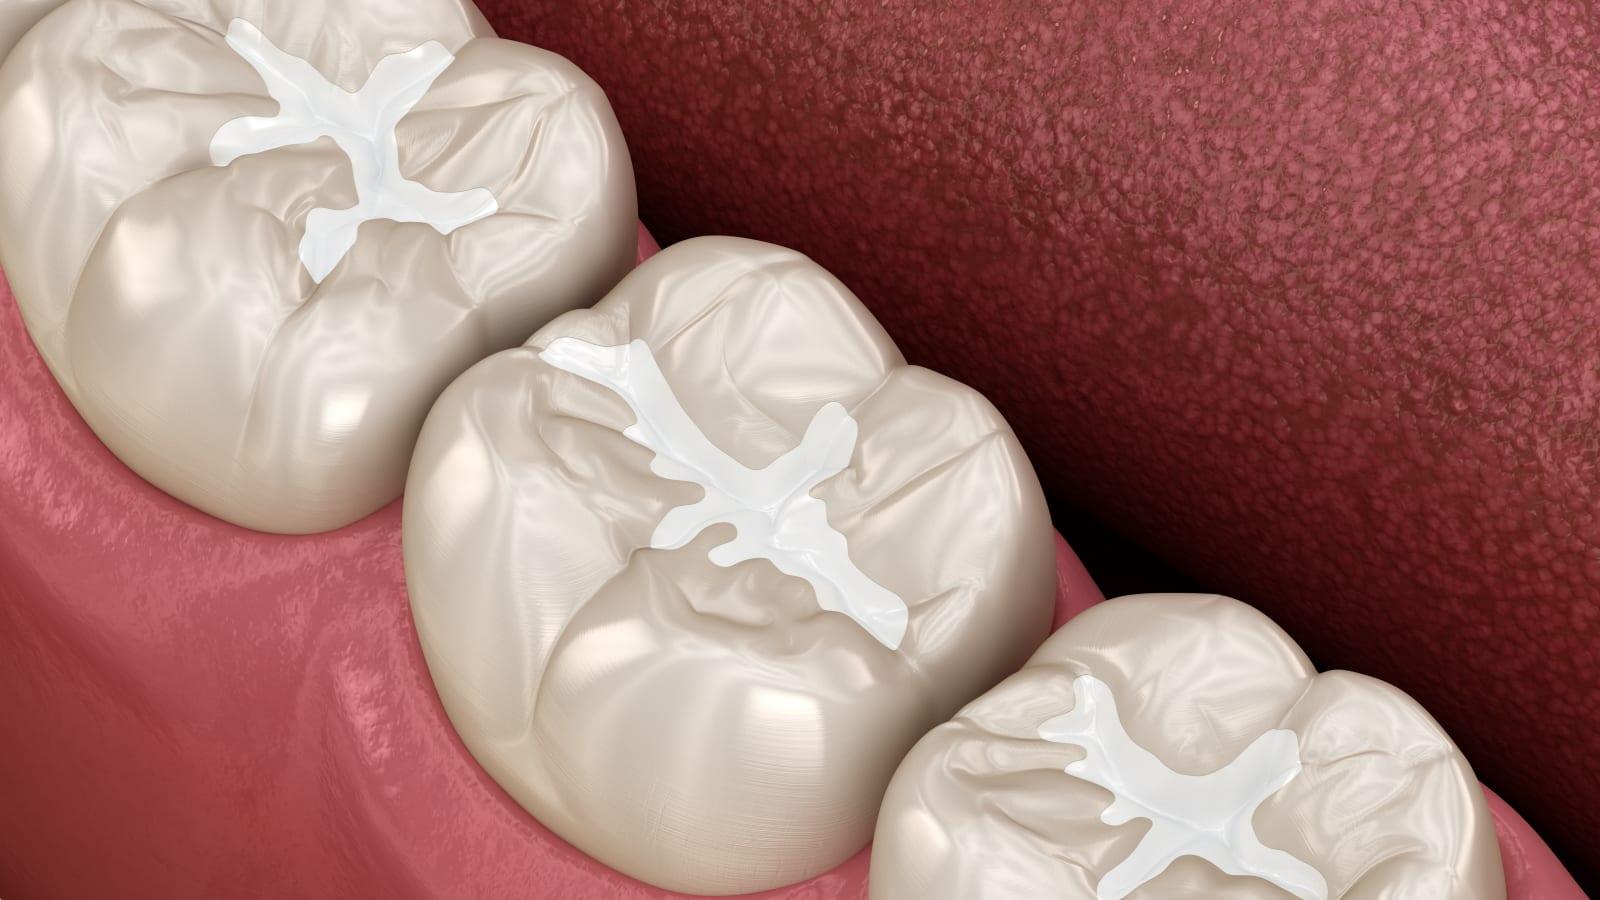 Image showing dental sealants